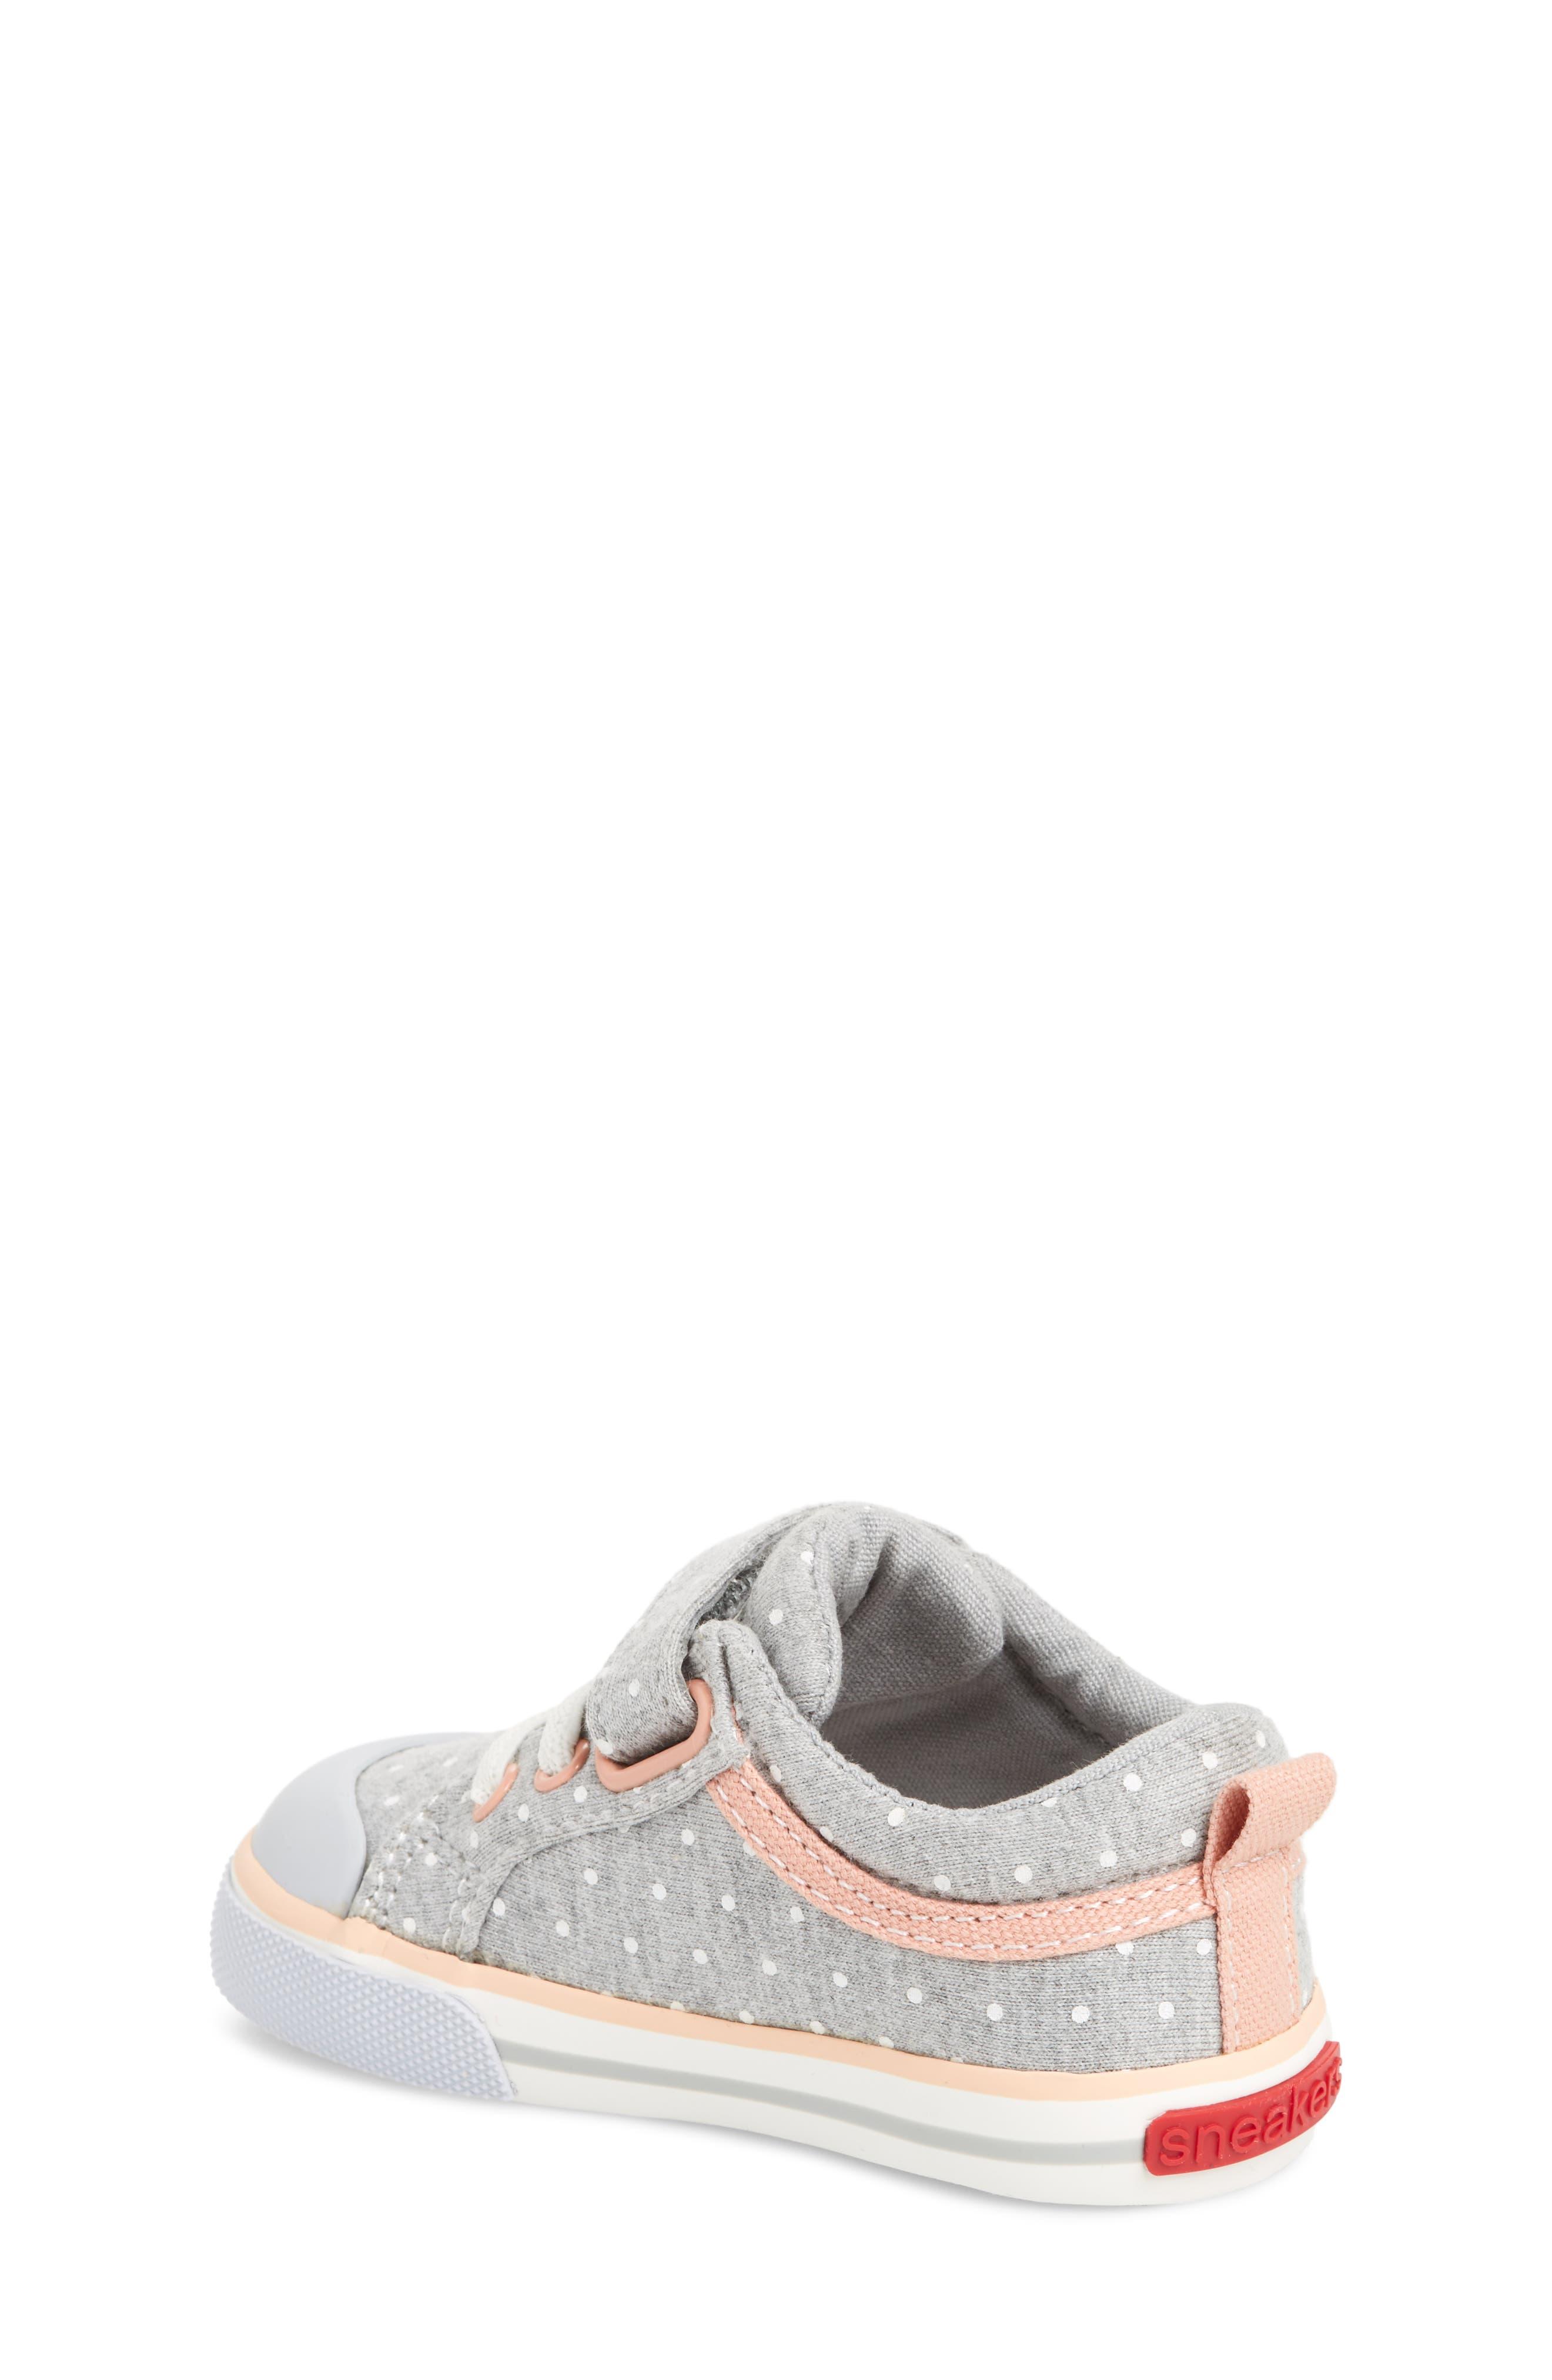 Kristin Sneaker,                             Alternate thumbnail 2, color,                             023